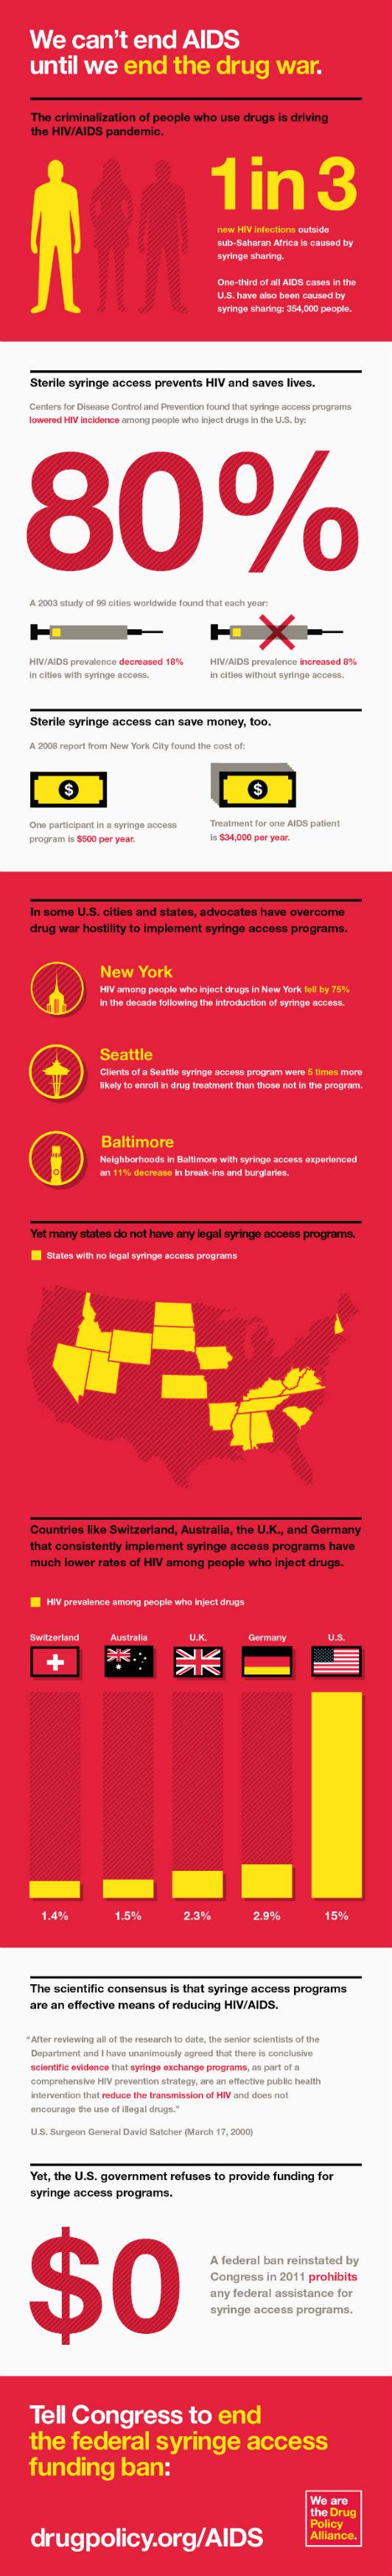 2012-11-30-infographic.jpg